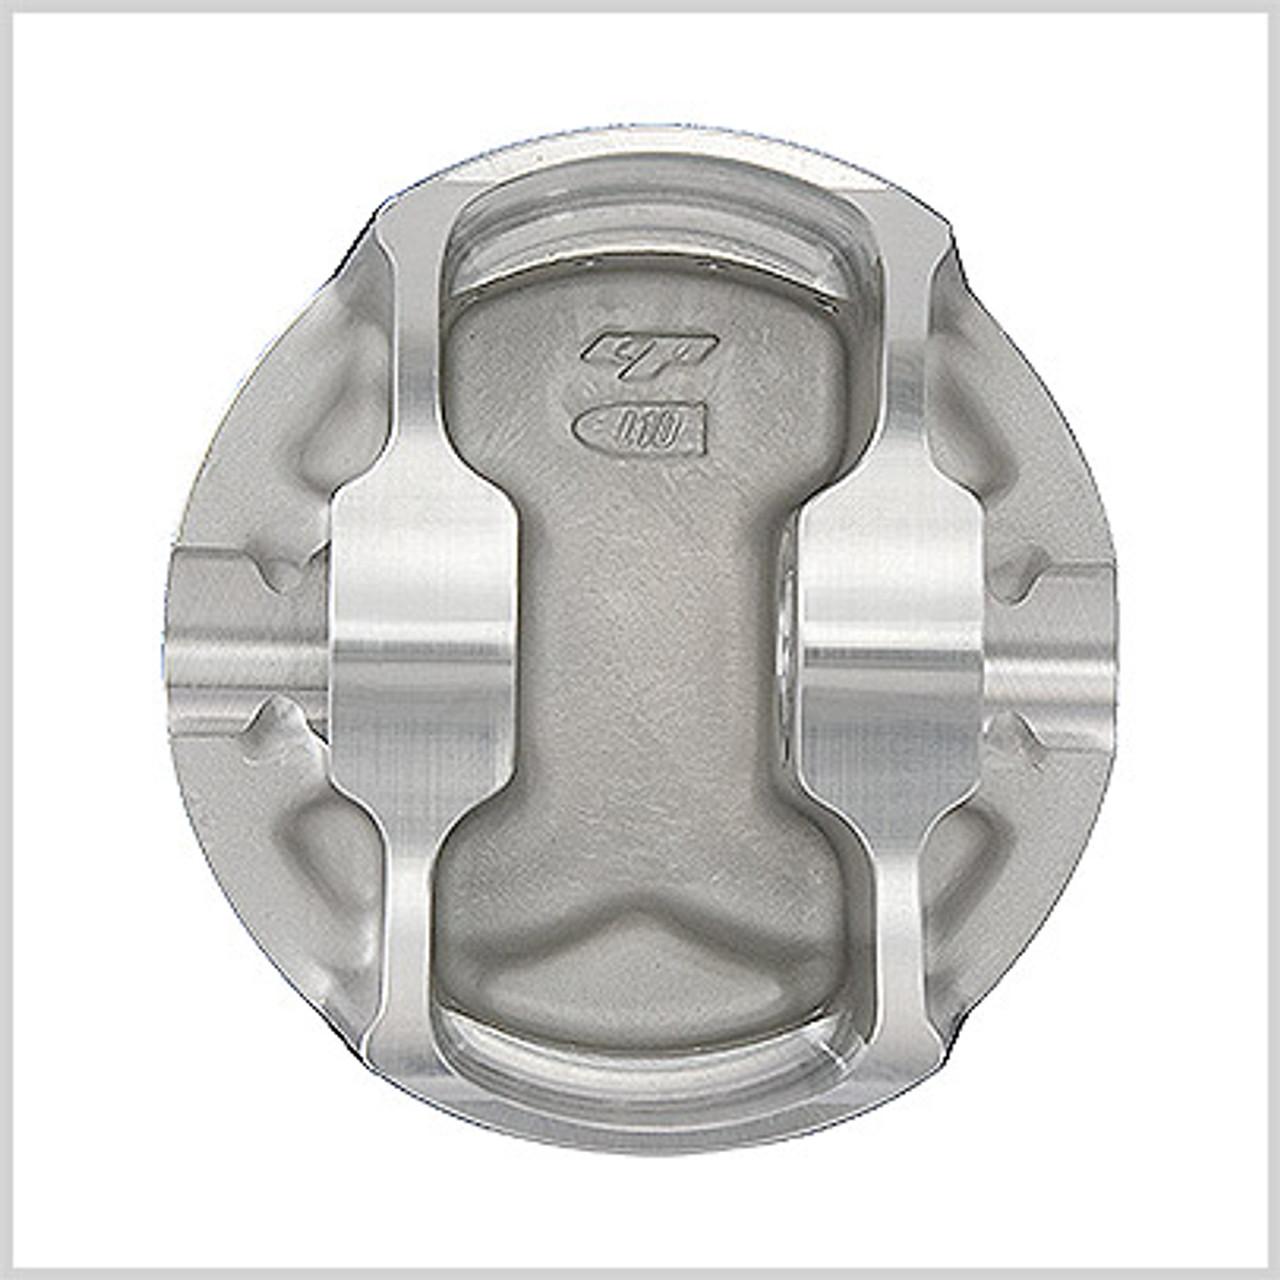 "Carillo CP Bullet LS 4.030"" Pistons Set | 3.622"" Stroke -13cc Dish Top | POWER ADDER"